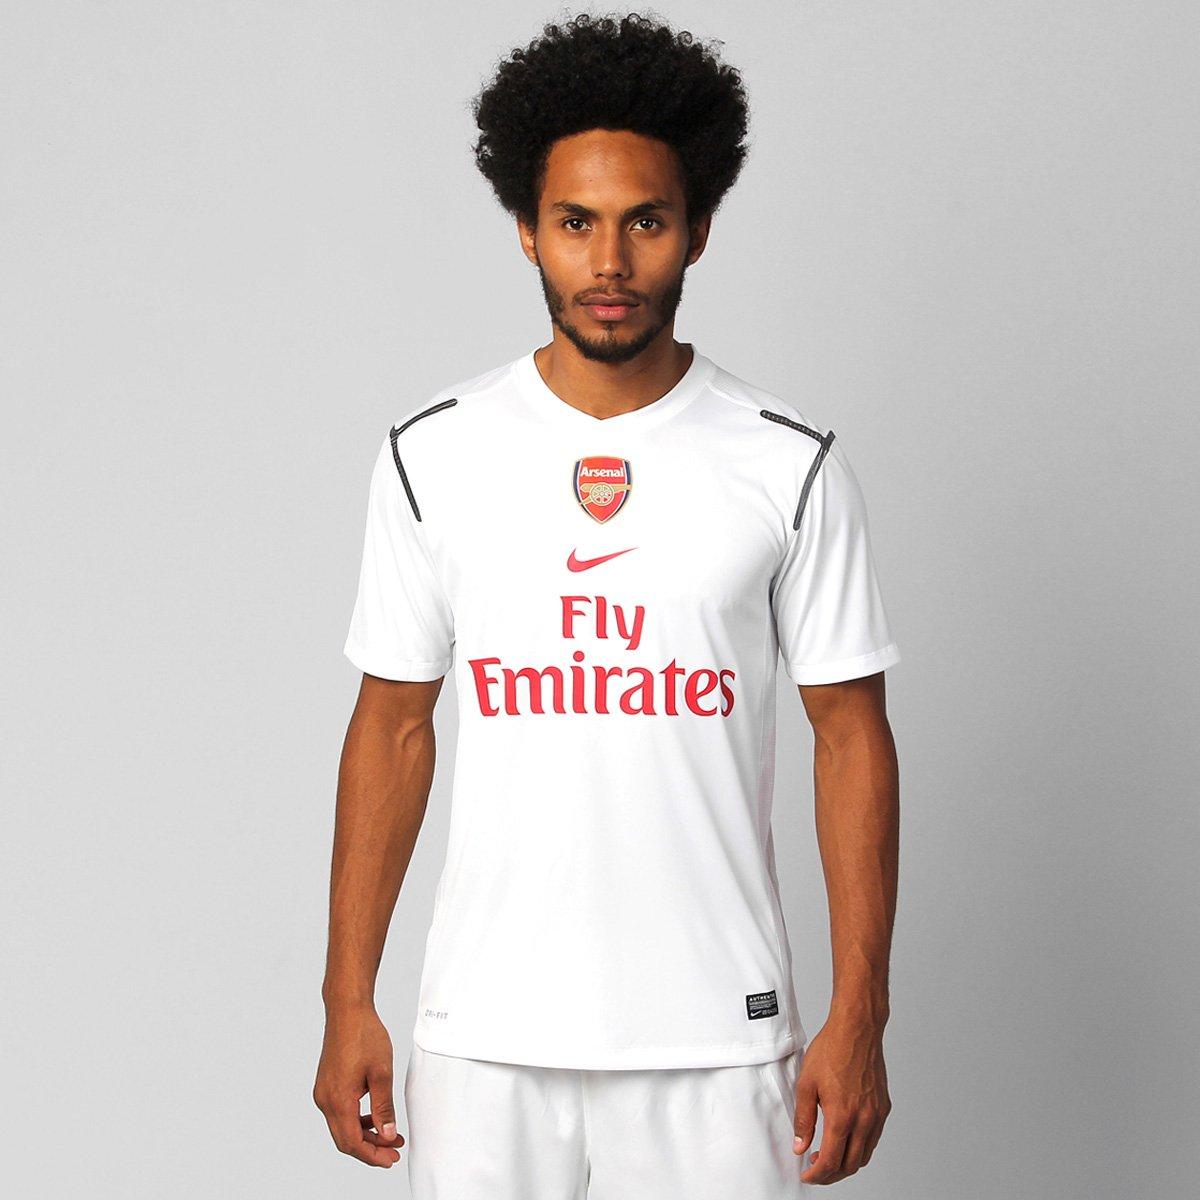 411452737d Camisa Nike Arsenal Pre Match 12 13 - Compre Agora